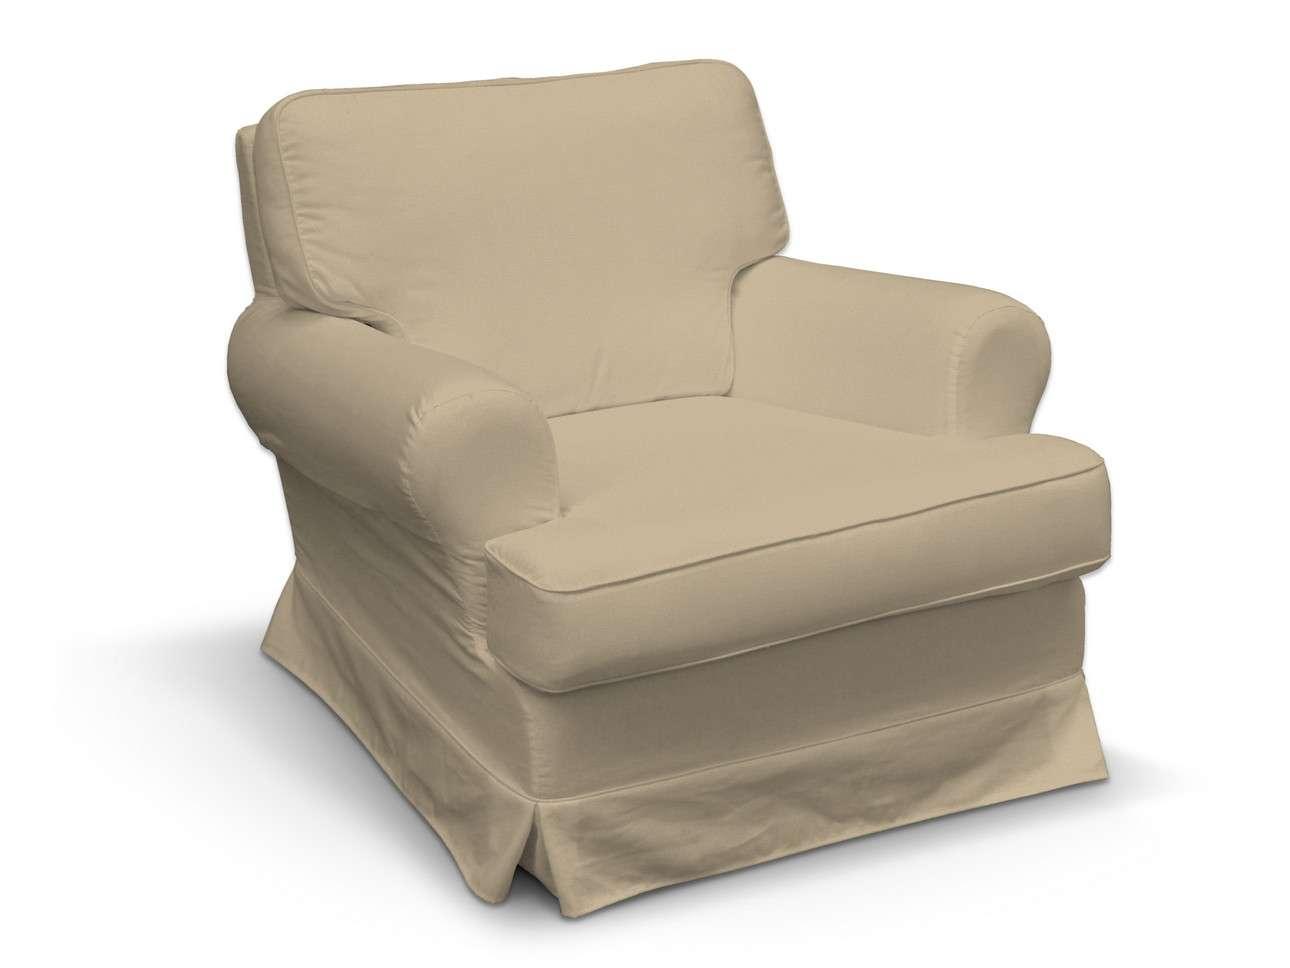 Barkaby Sesselbezug von der Kollektion Living, Stoff: 160-82